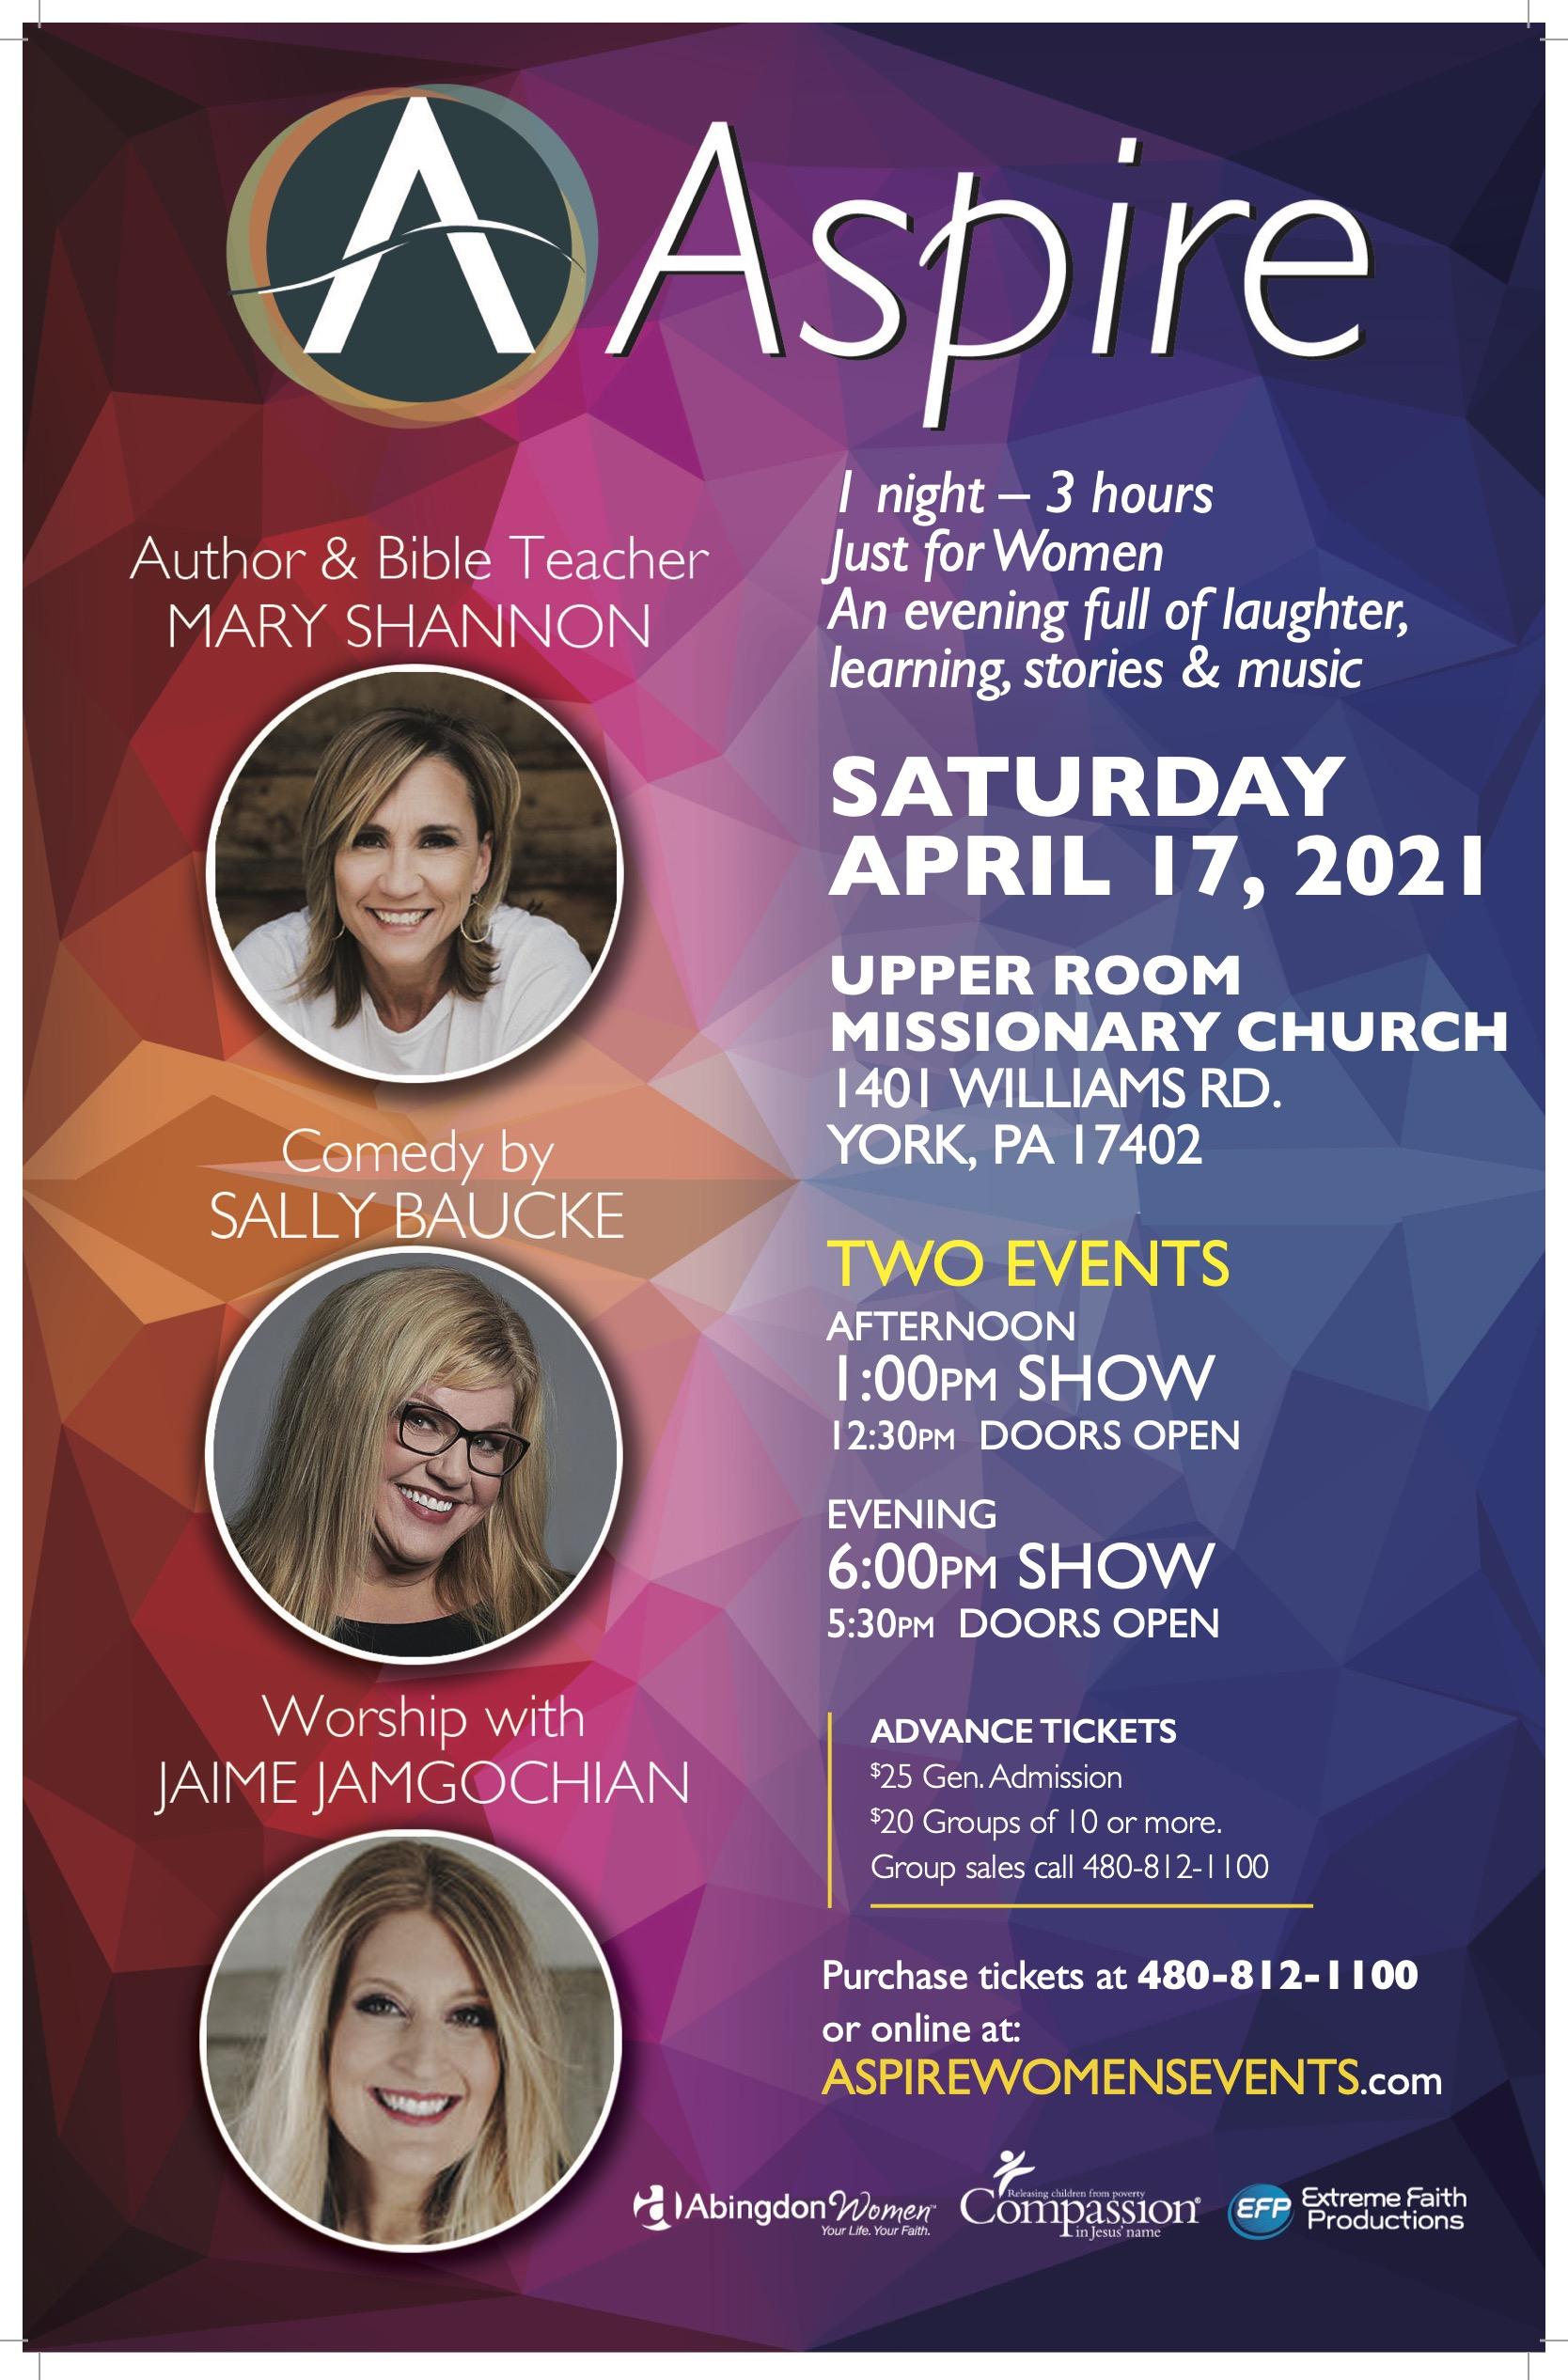 ASPIRE SAT-April 17- YORK PA